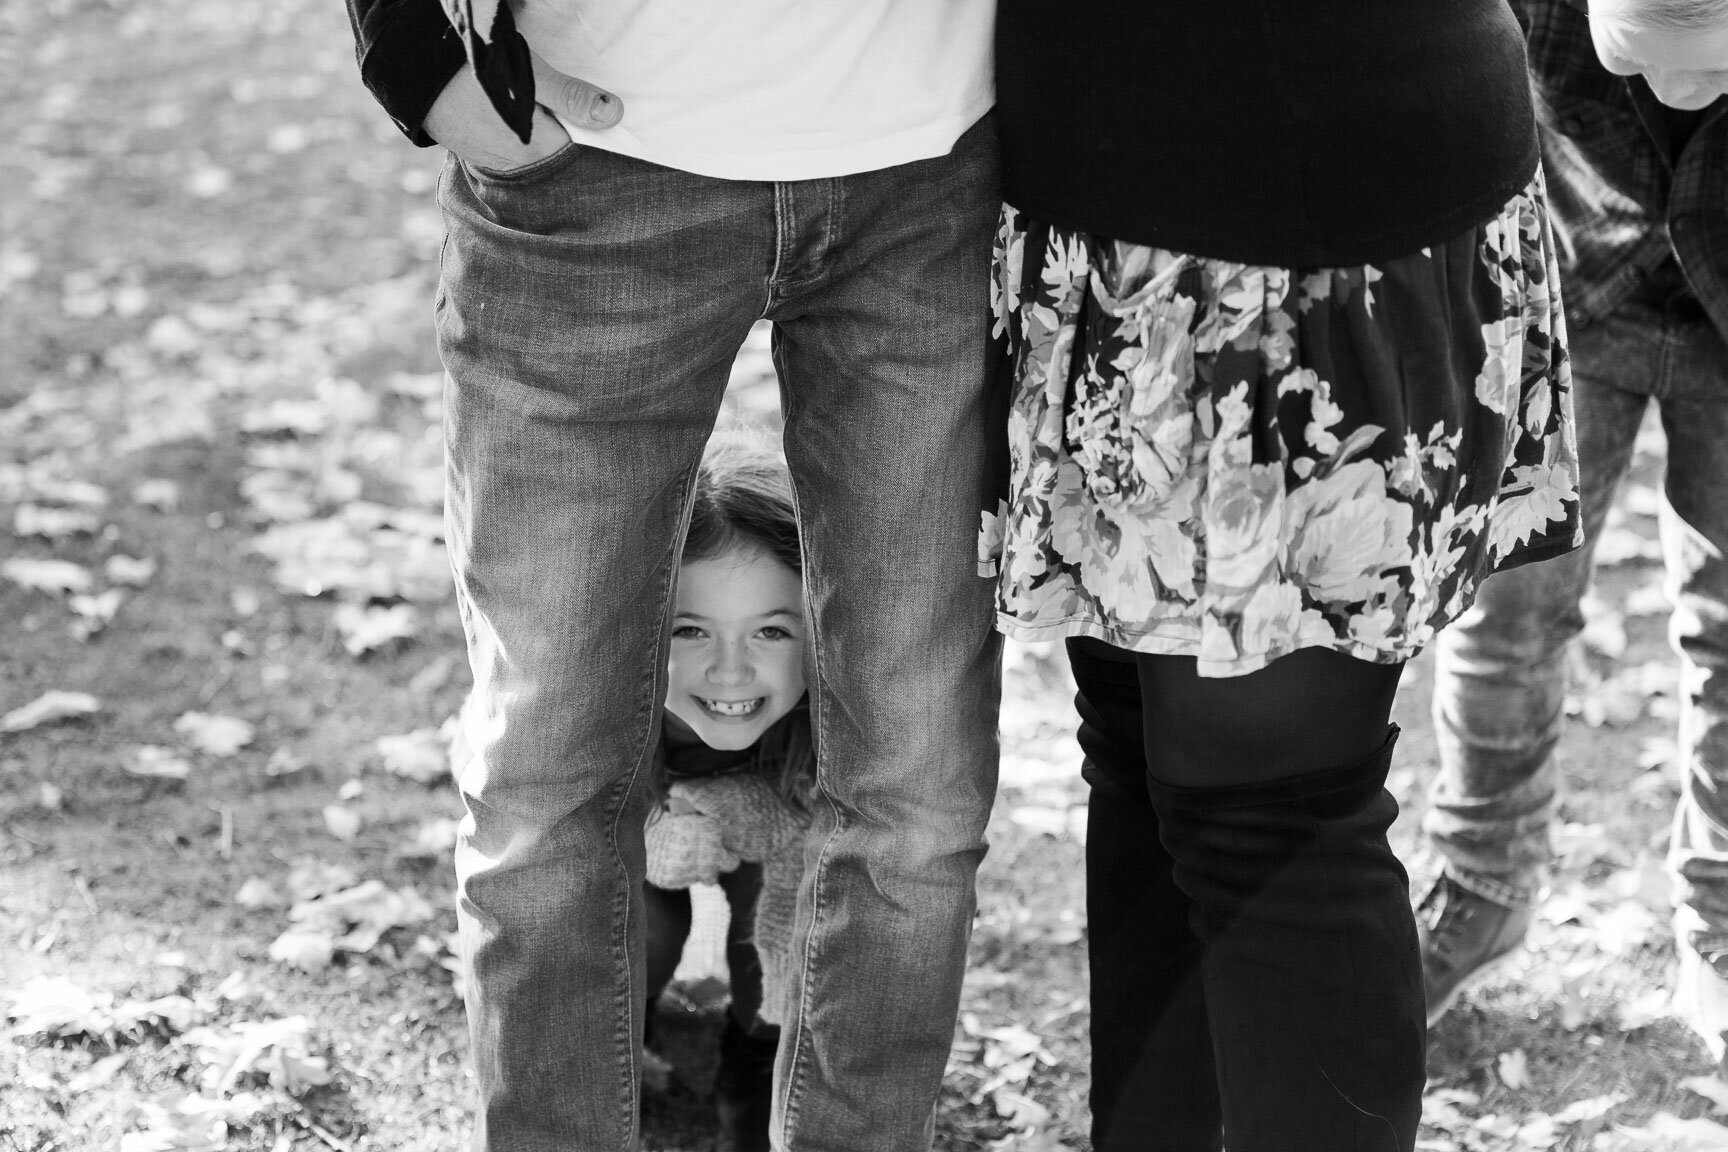 little girl peeping through legs